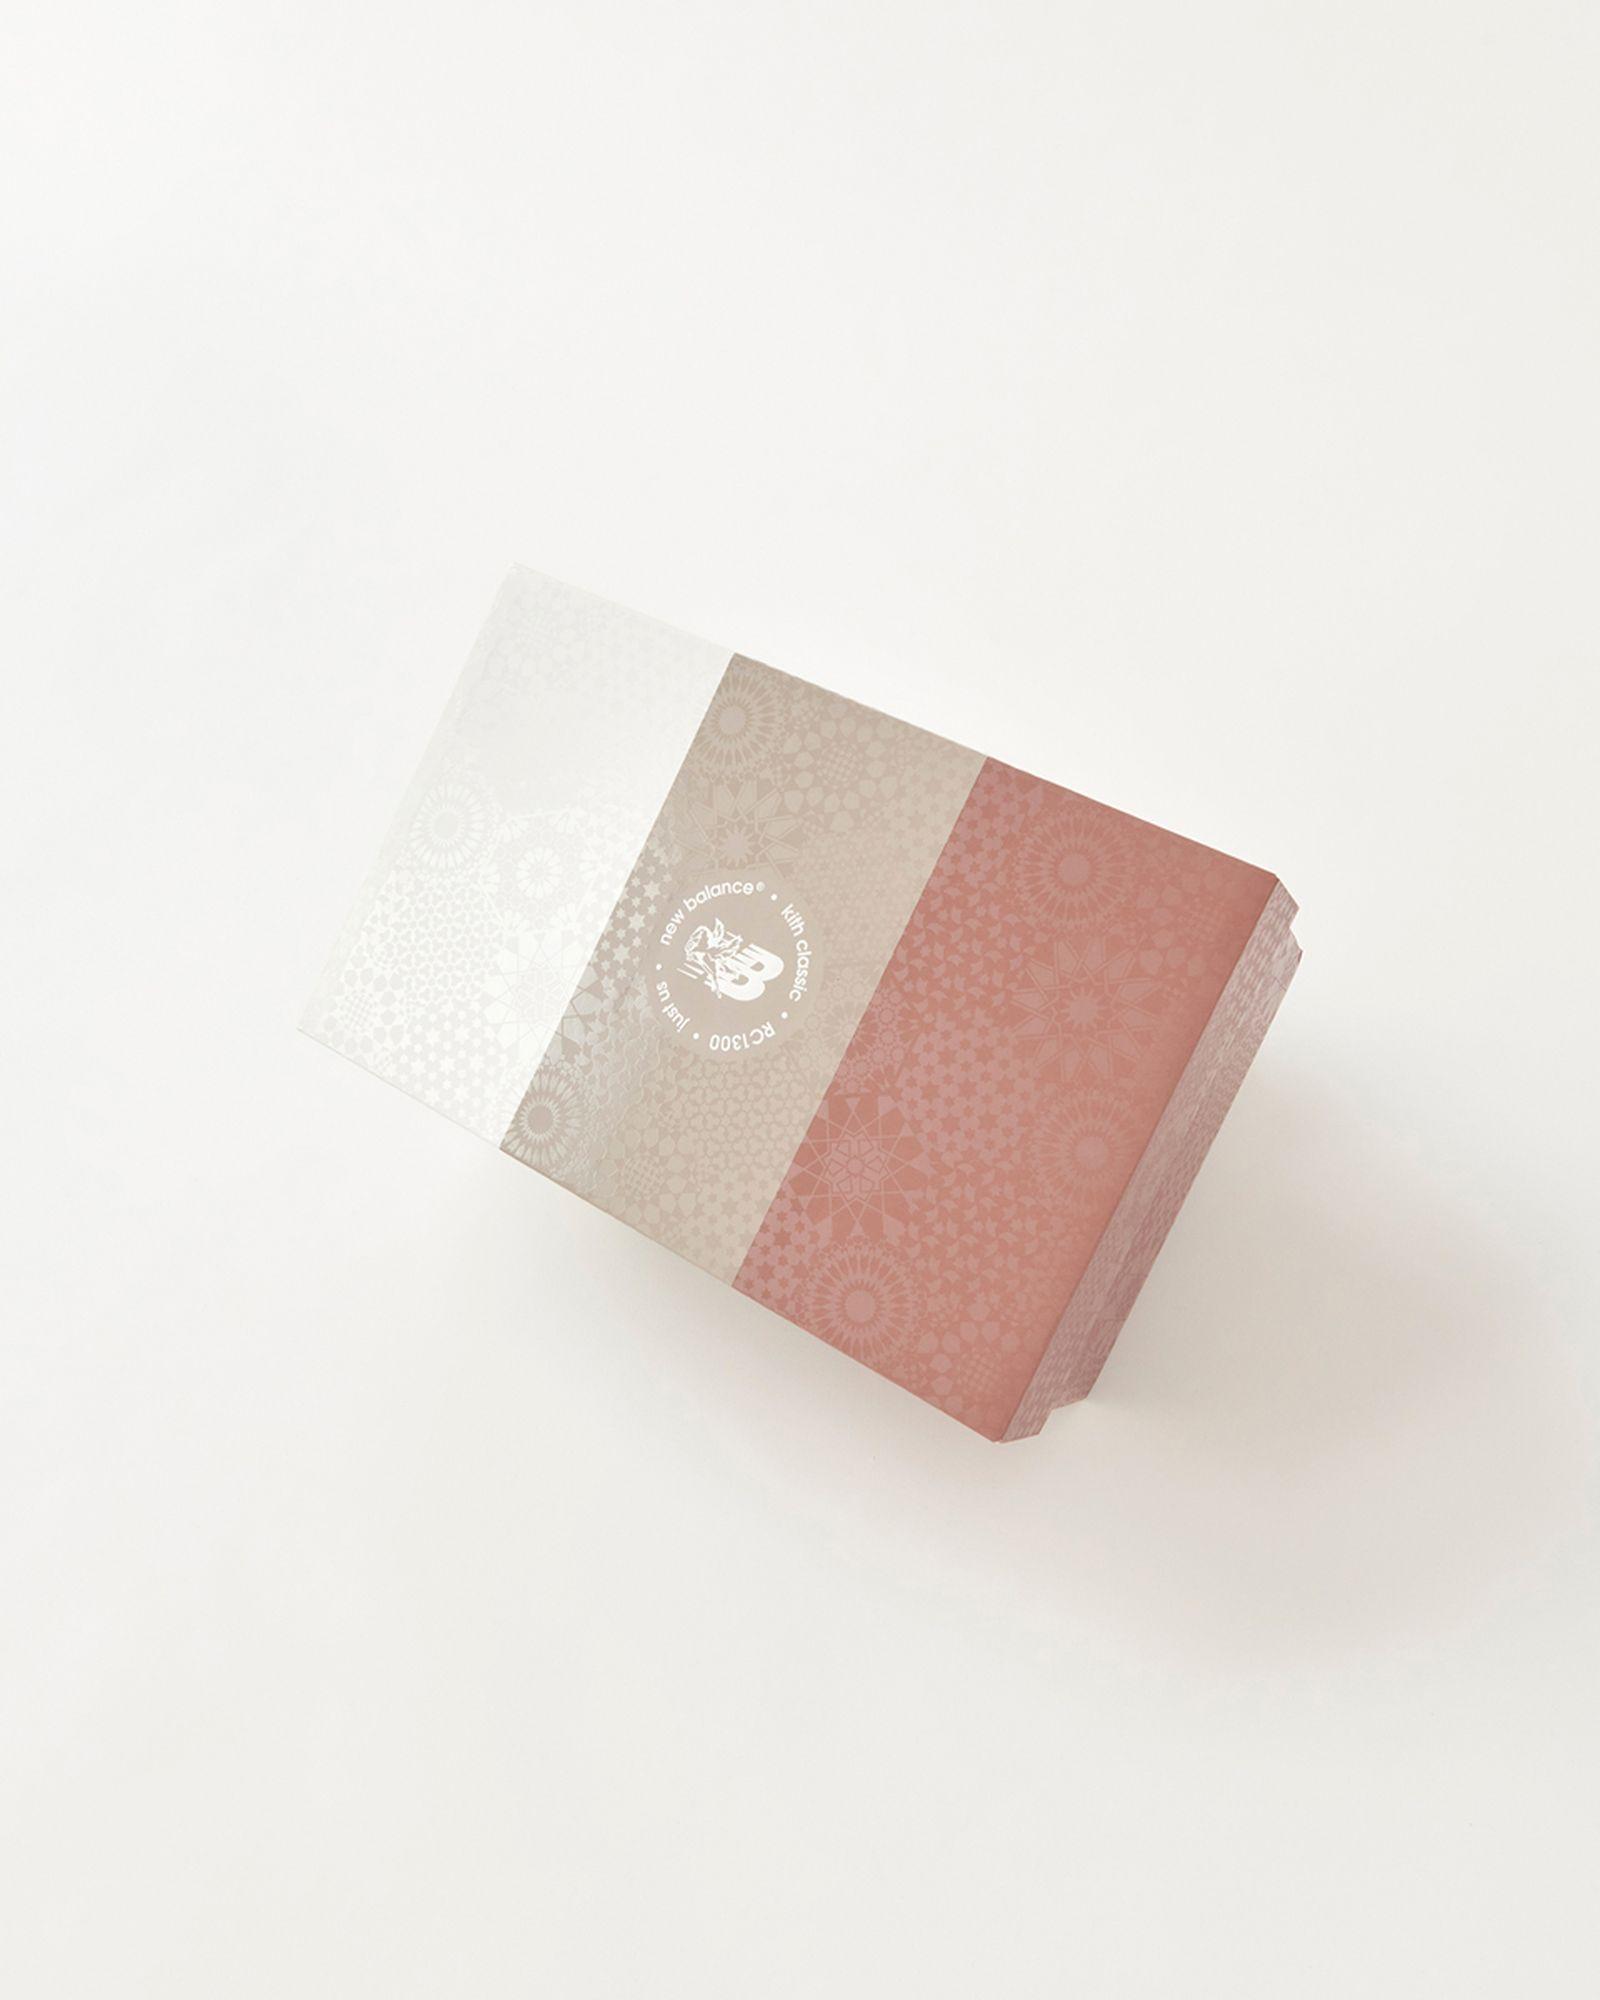 kith-new-balance-rc-1300-campaign-collab- (26)